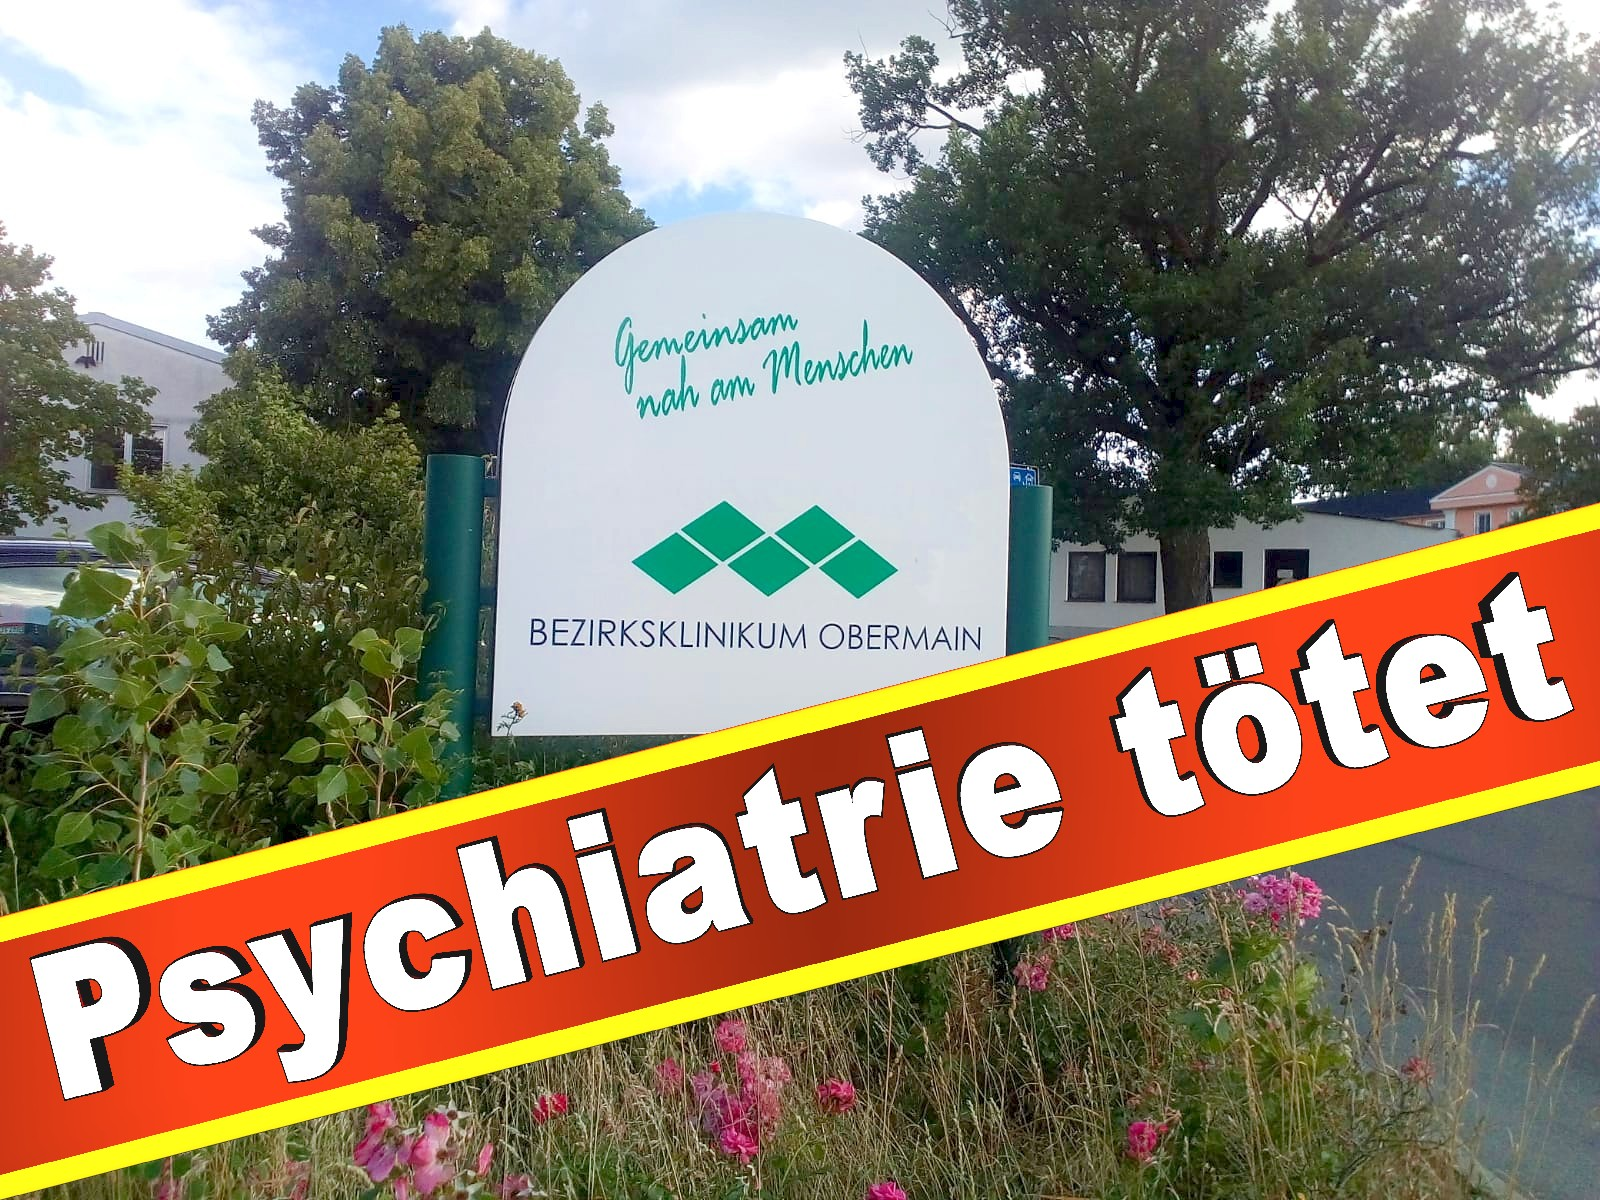 Bezirksklinikum Obermain Kutzenberg, 96250 Ebensfeld Psychiatrie Polizei Krankenhaus (10)